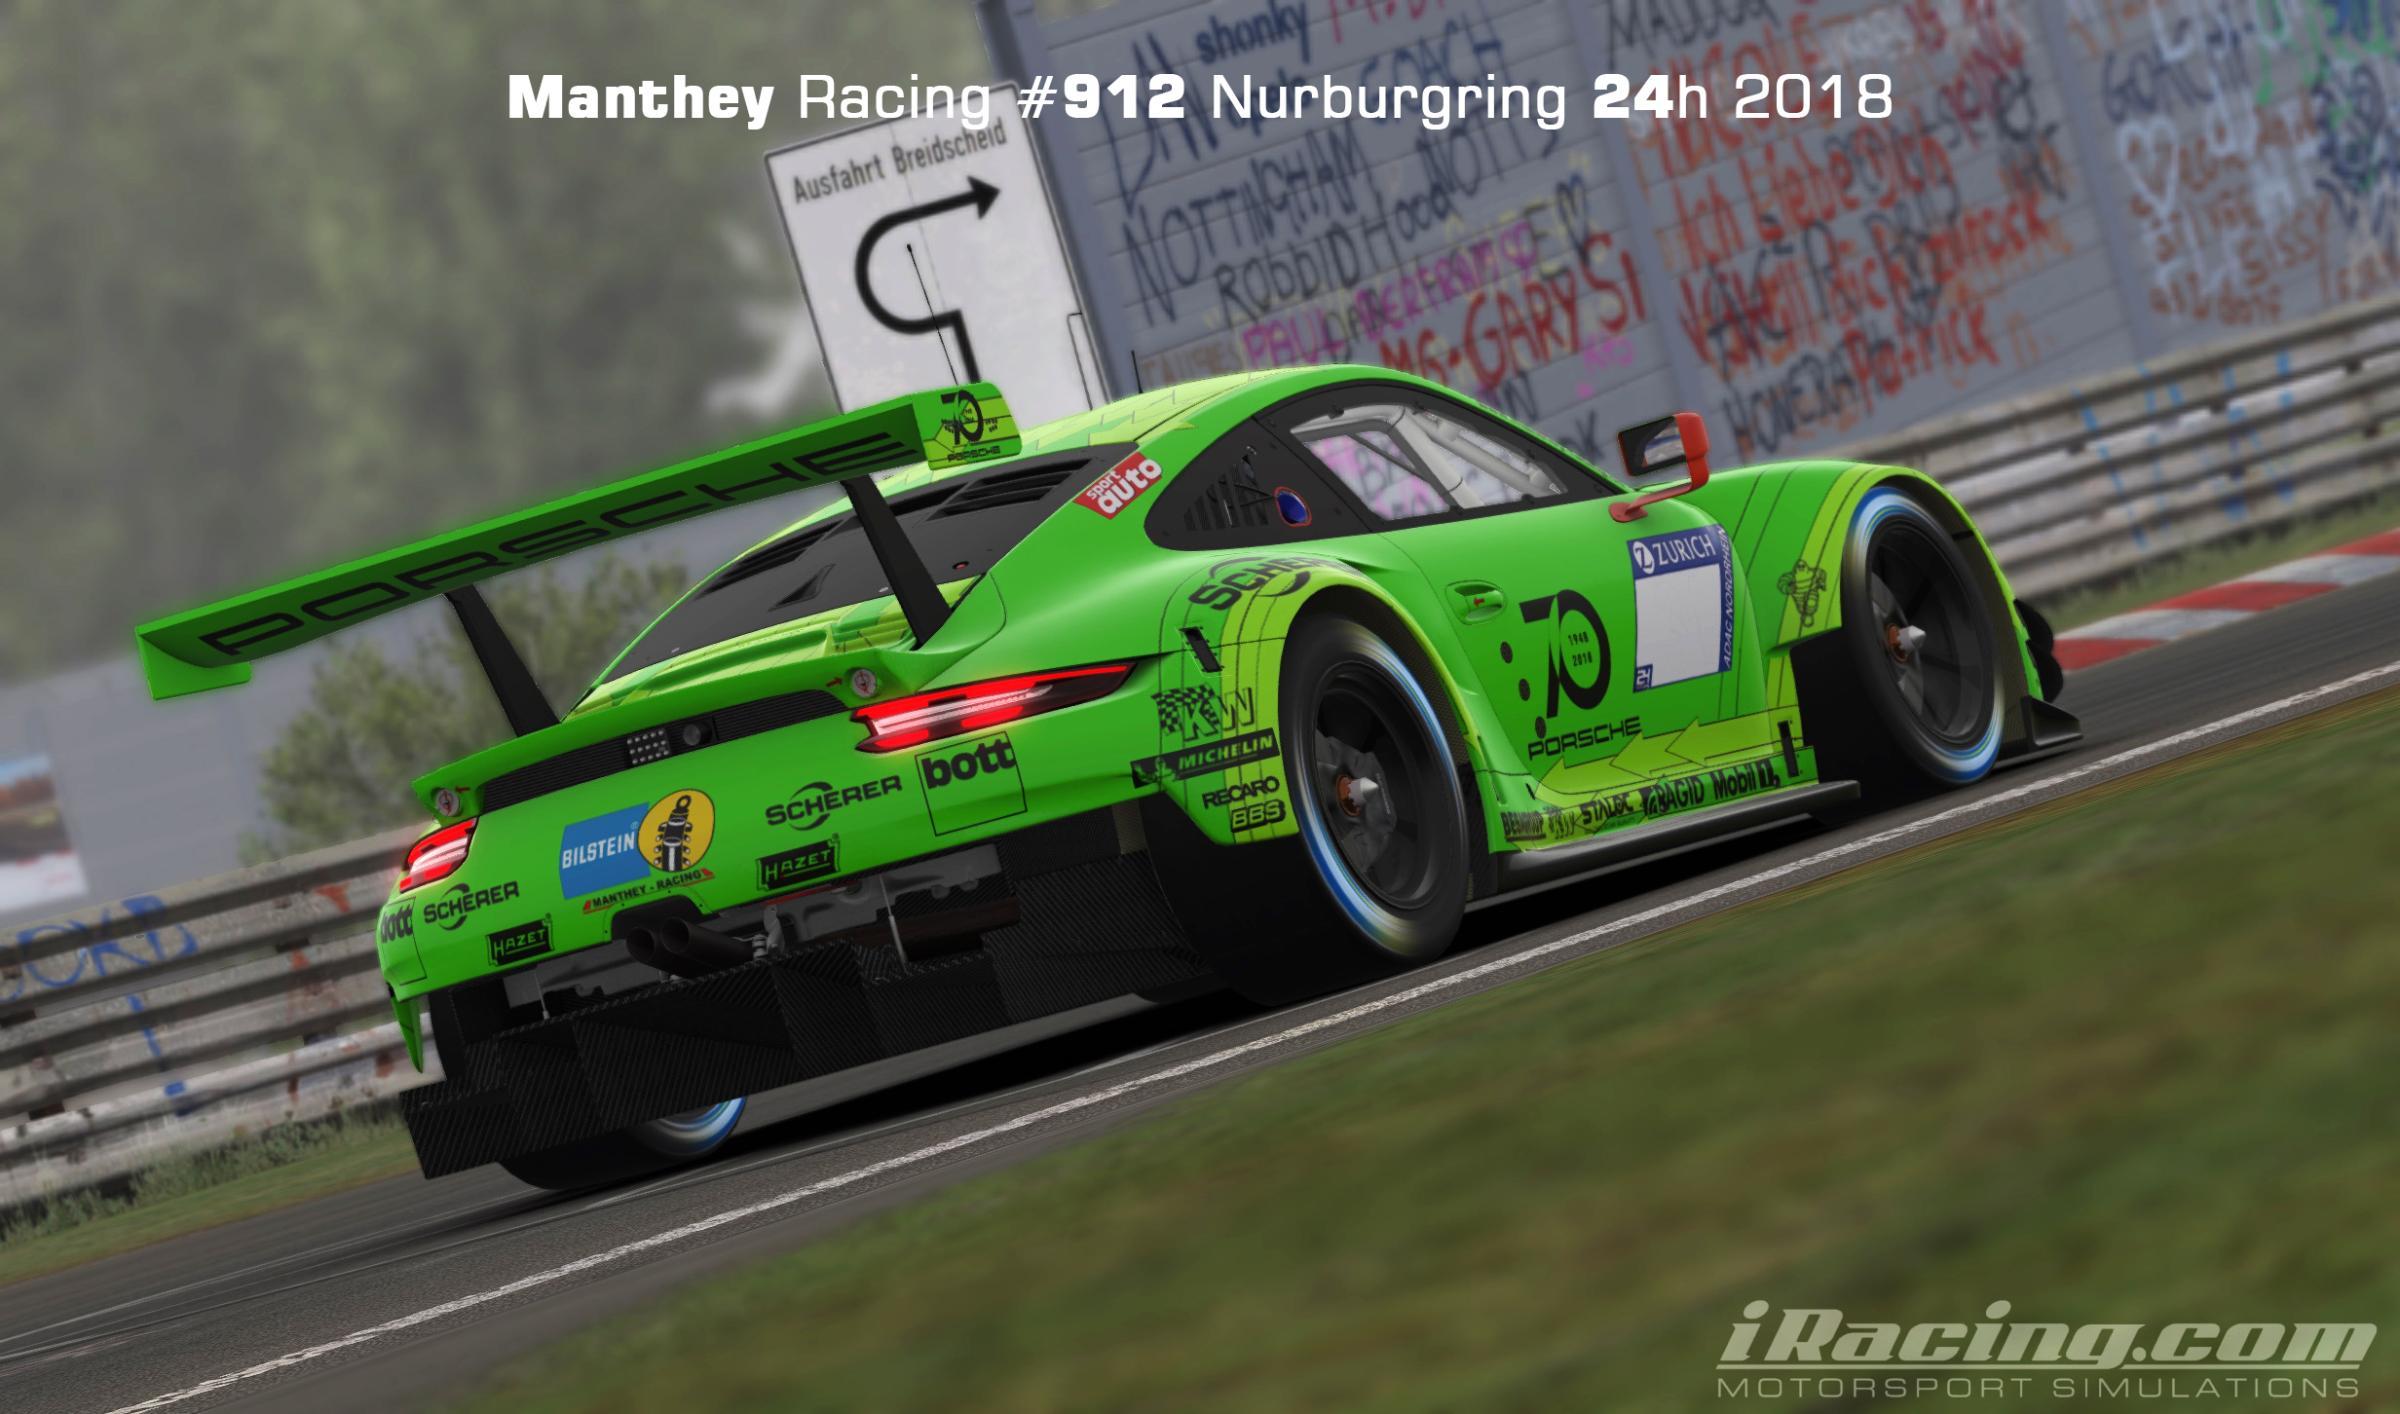 Preview of Manthey Racing #912 Nurburgring 24h 2018 by Yuji Asakawa